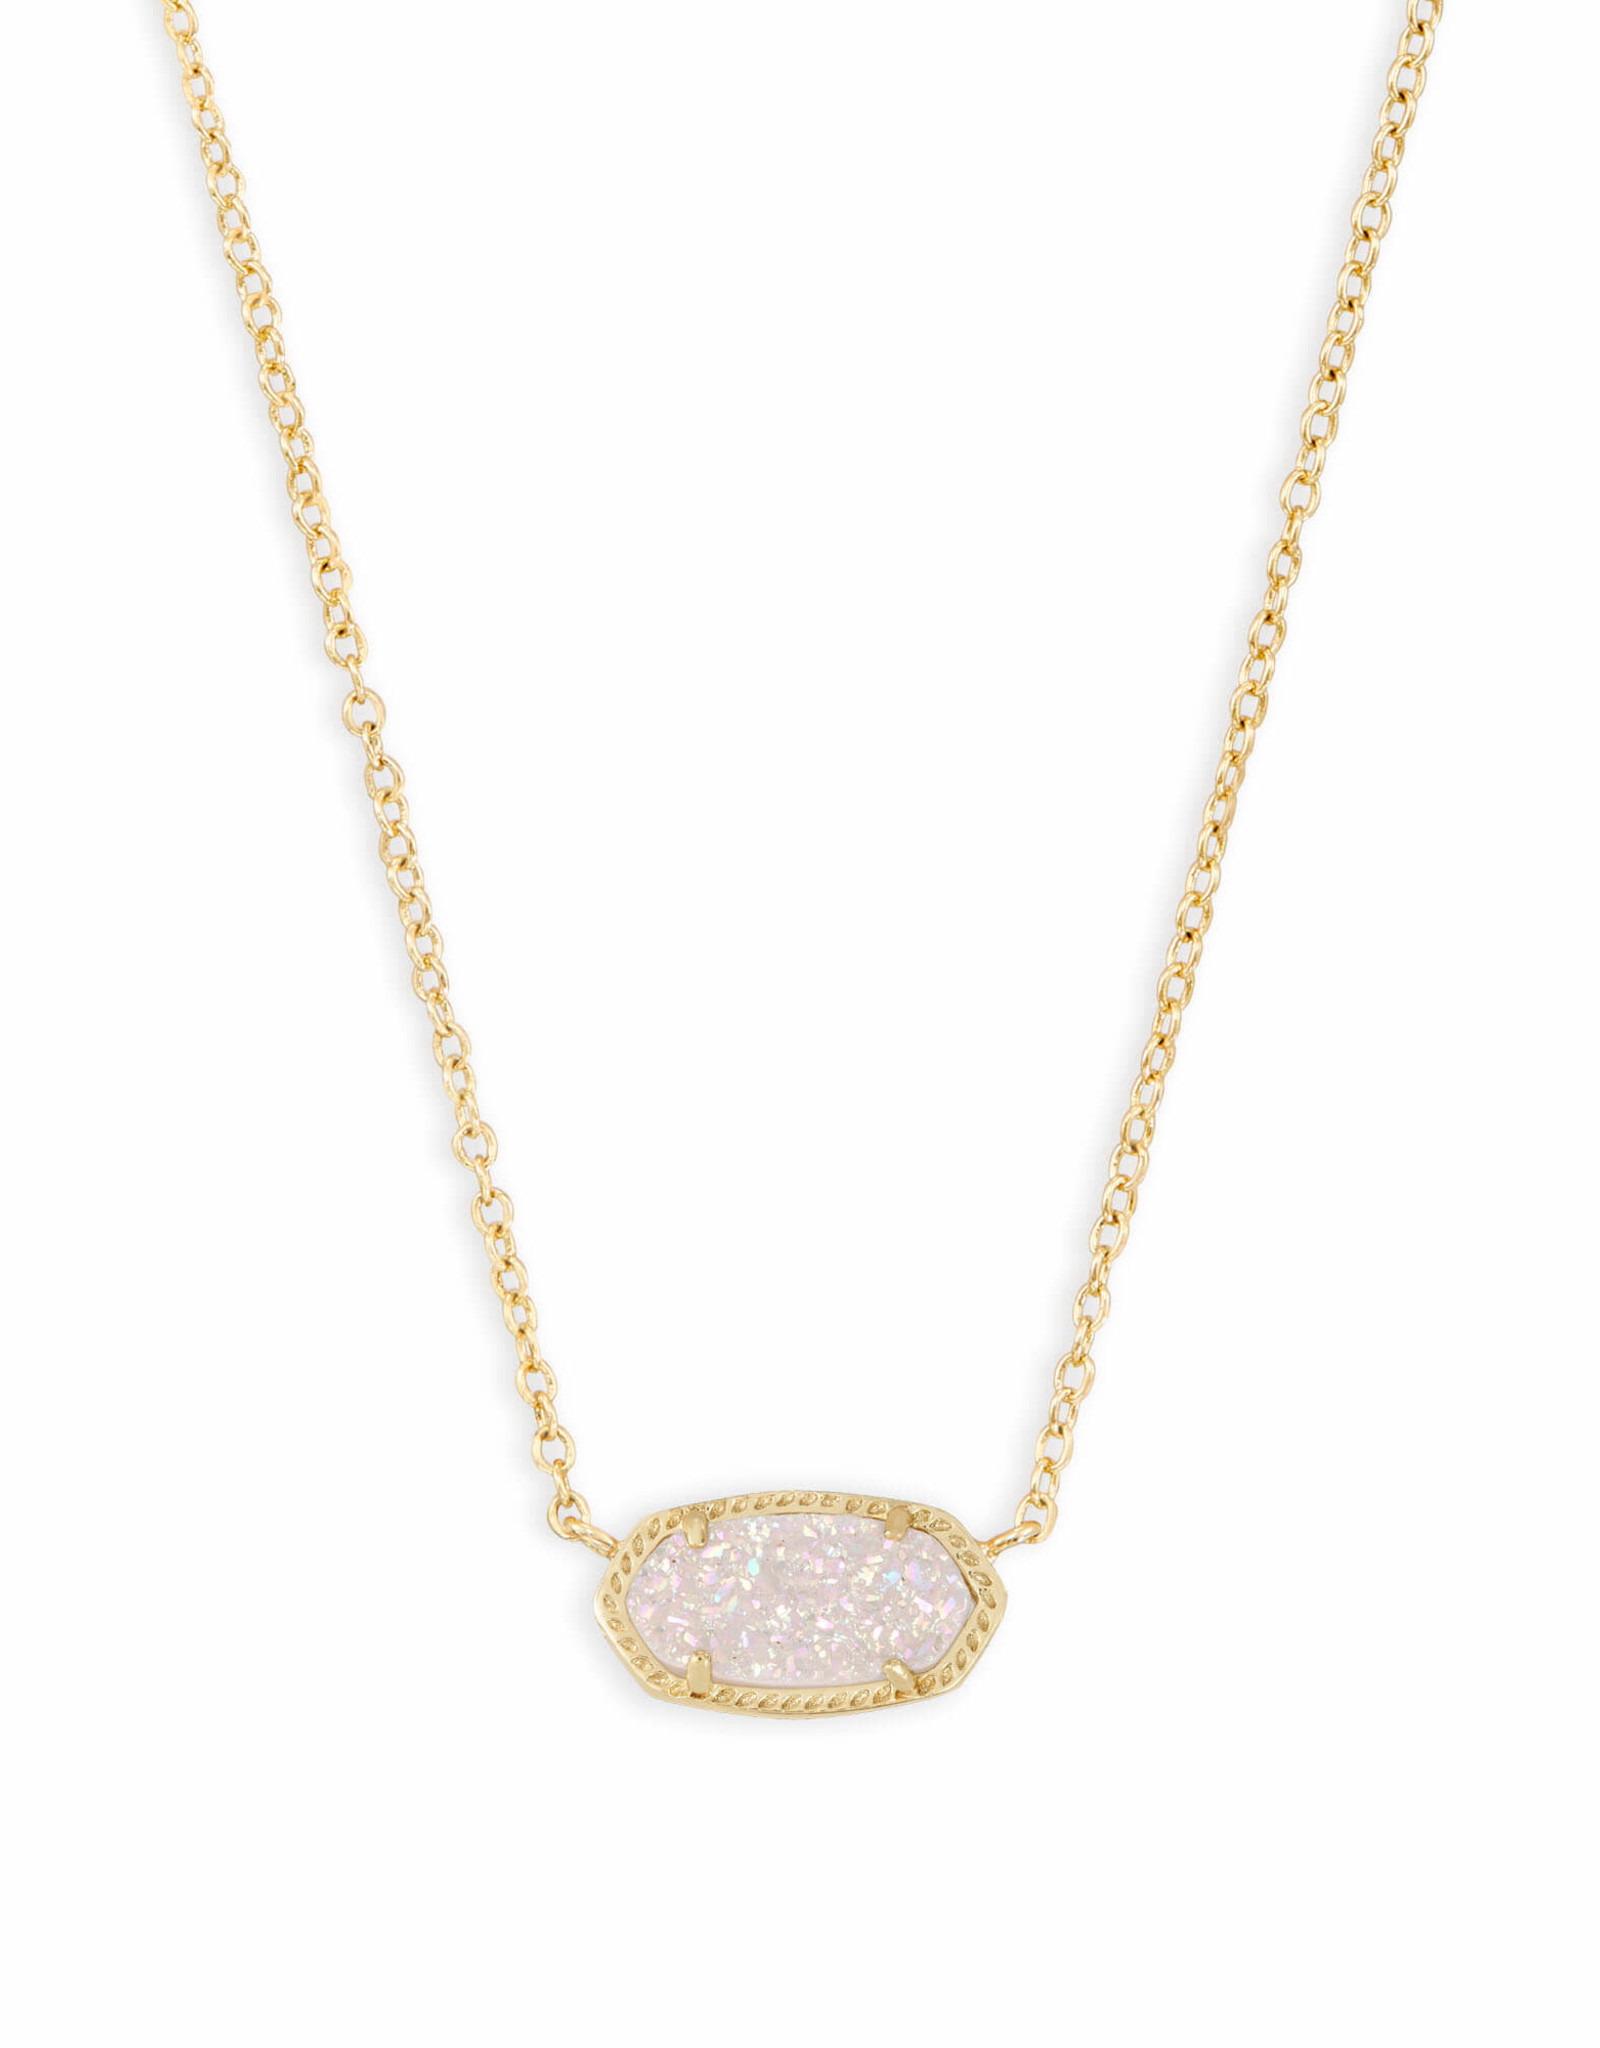 Kendra Scott Elisa Necklace - Iridescent Drusy/Gold